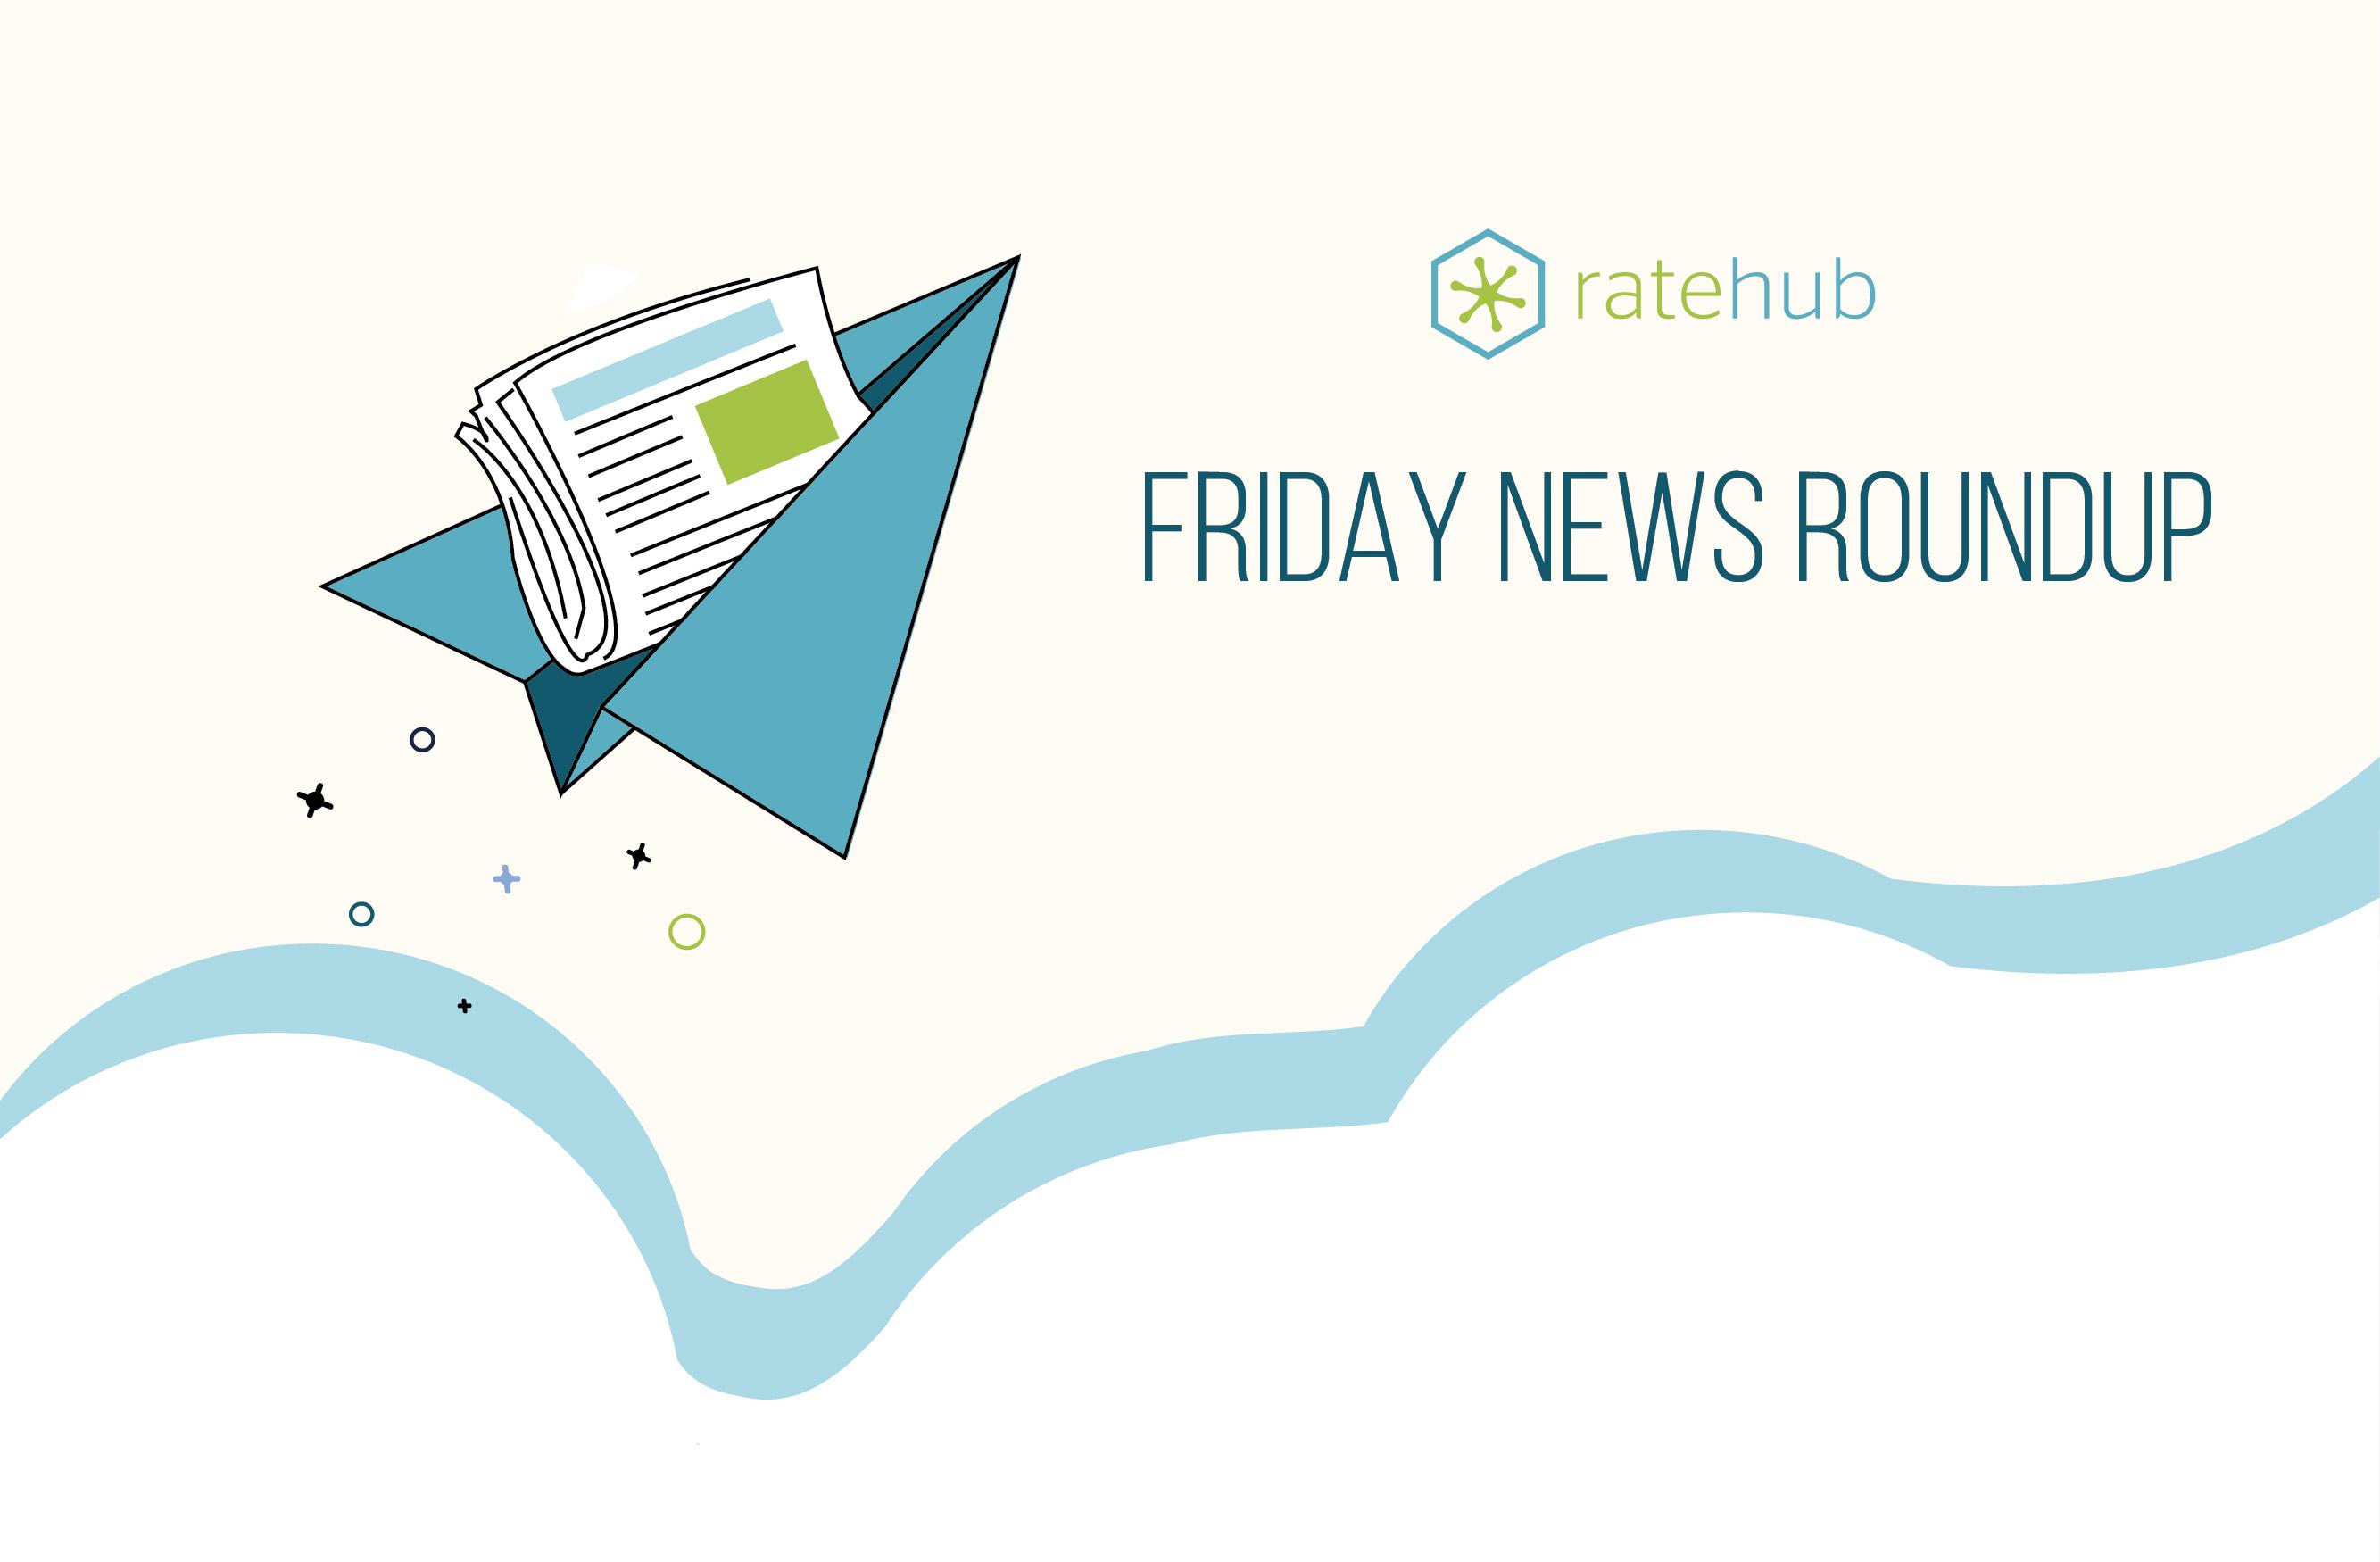 Friday News Roundup